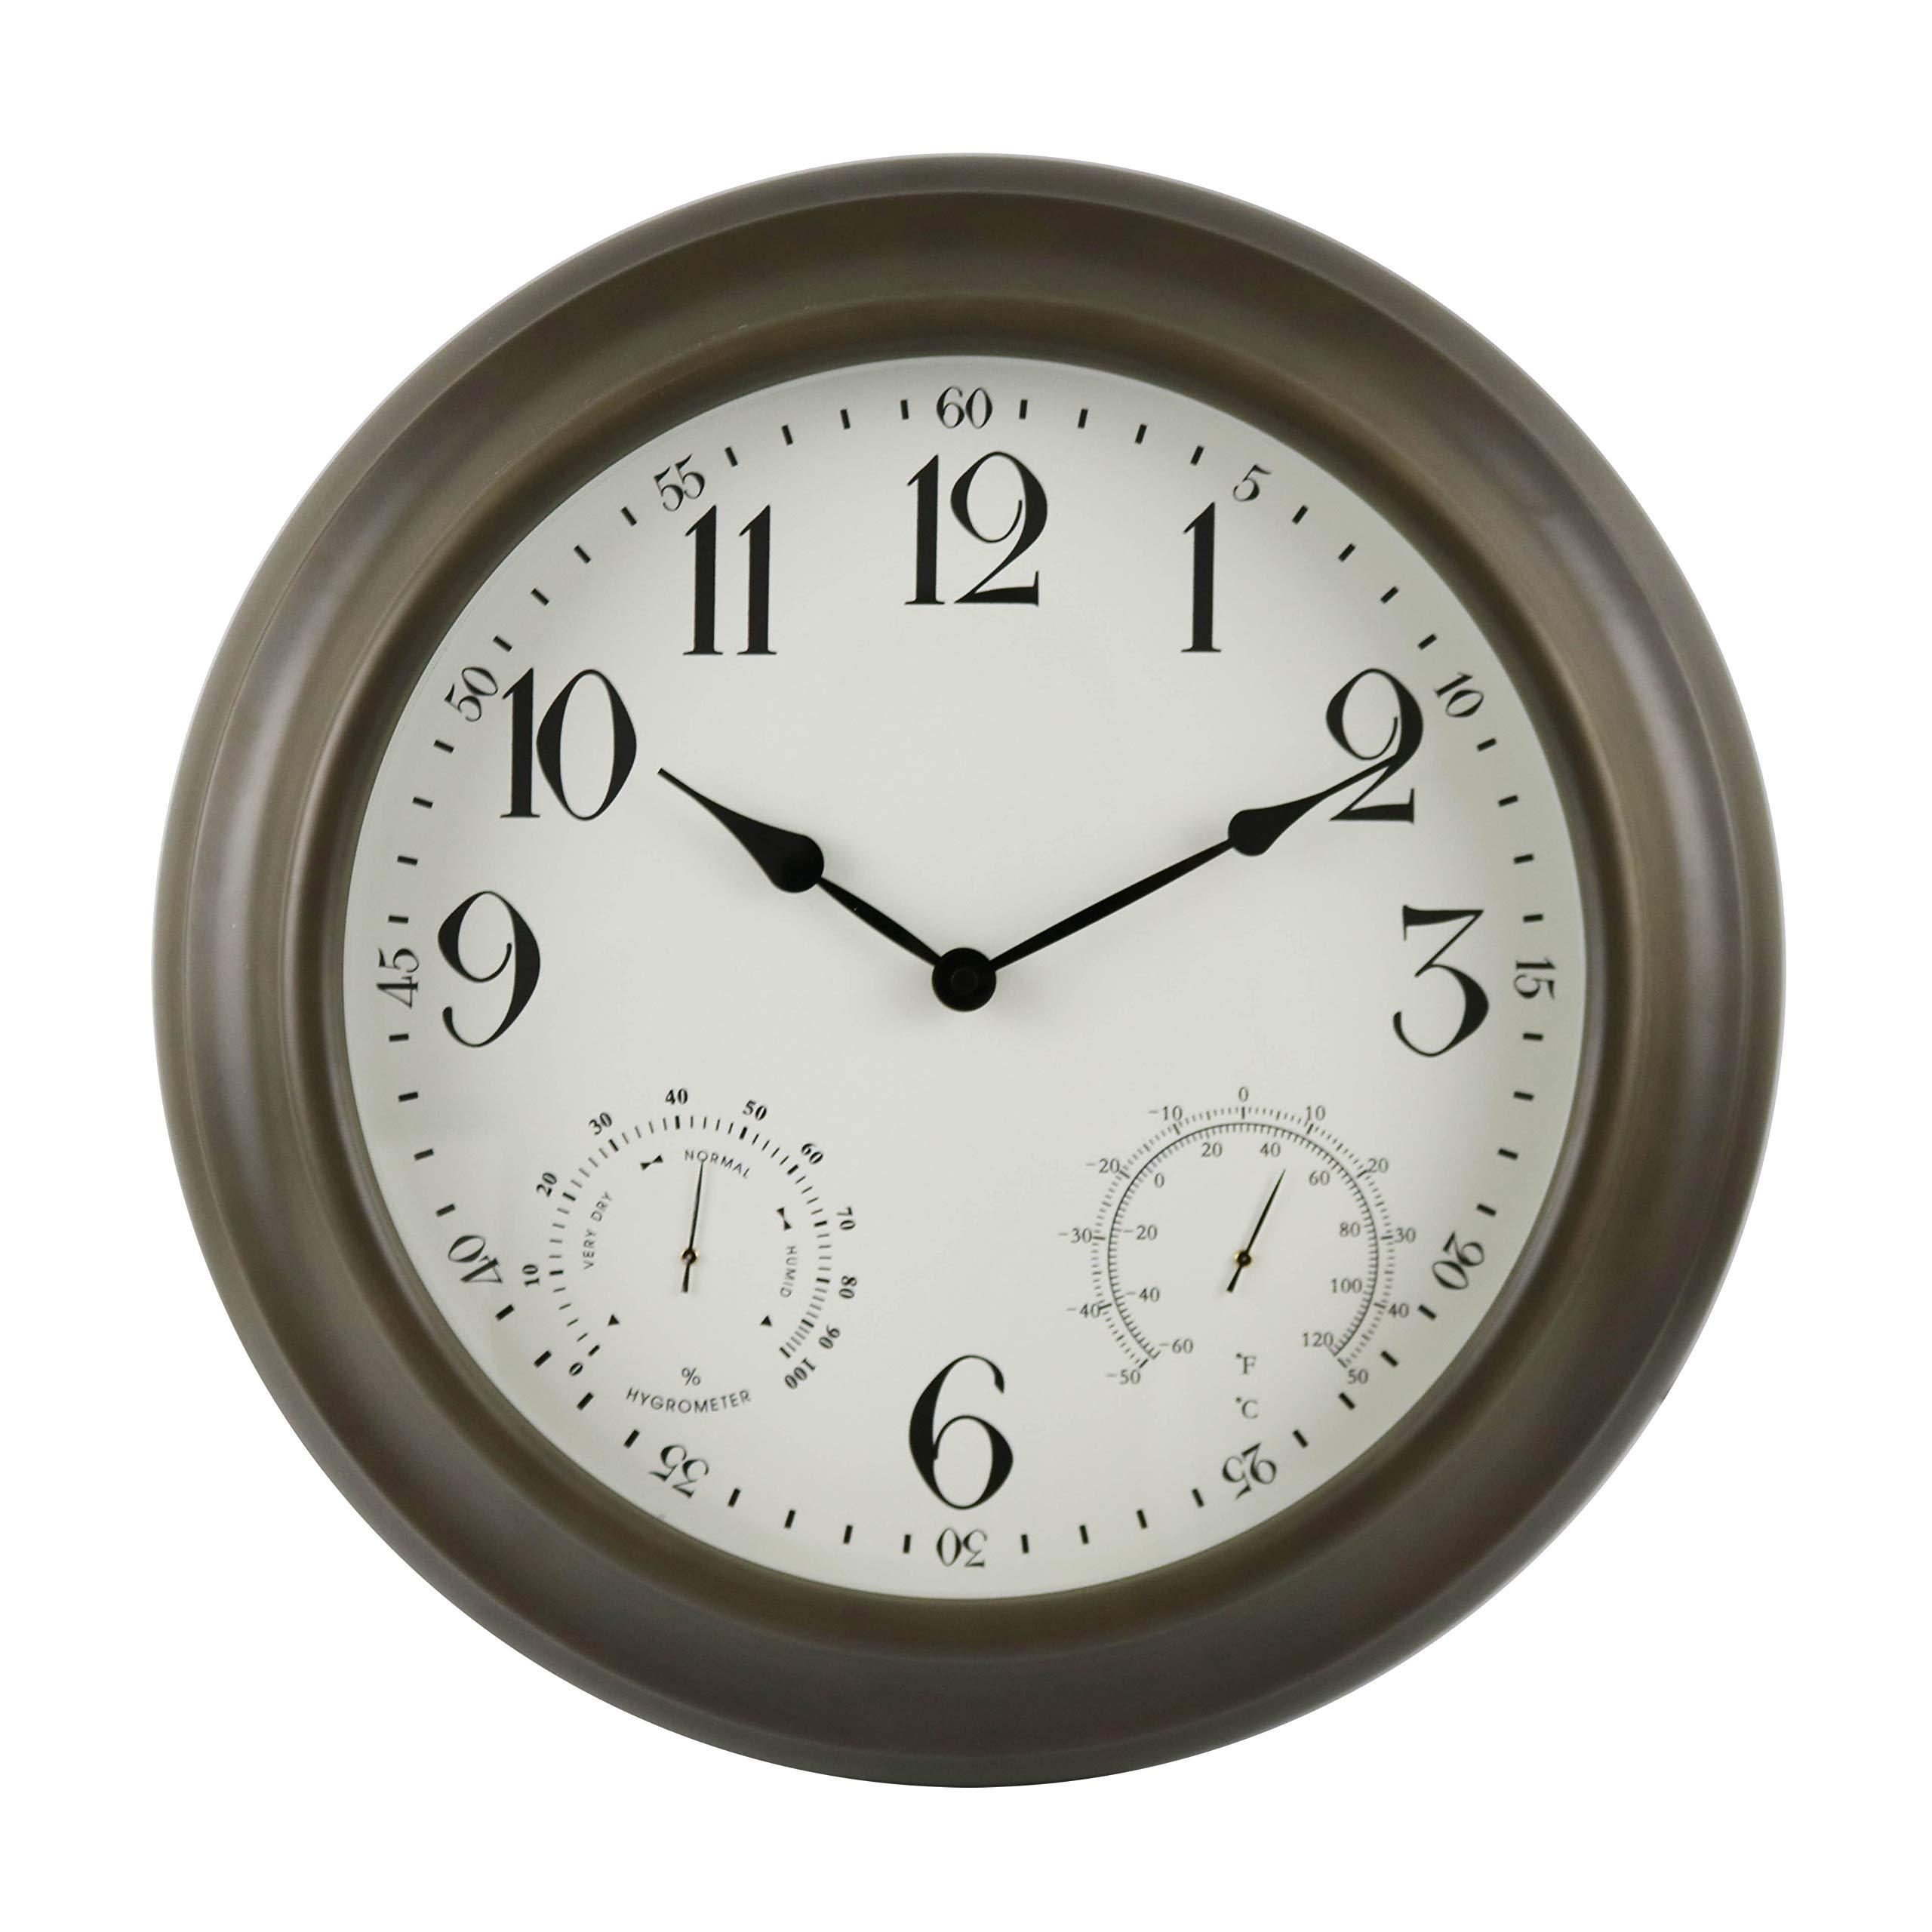 BACKYARD EXPRESSIONS PATIO · HOME · GARDEN 914935 24'' Metal Indoor/Outdoor Weather Monitoring Clock, Rustic Brown